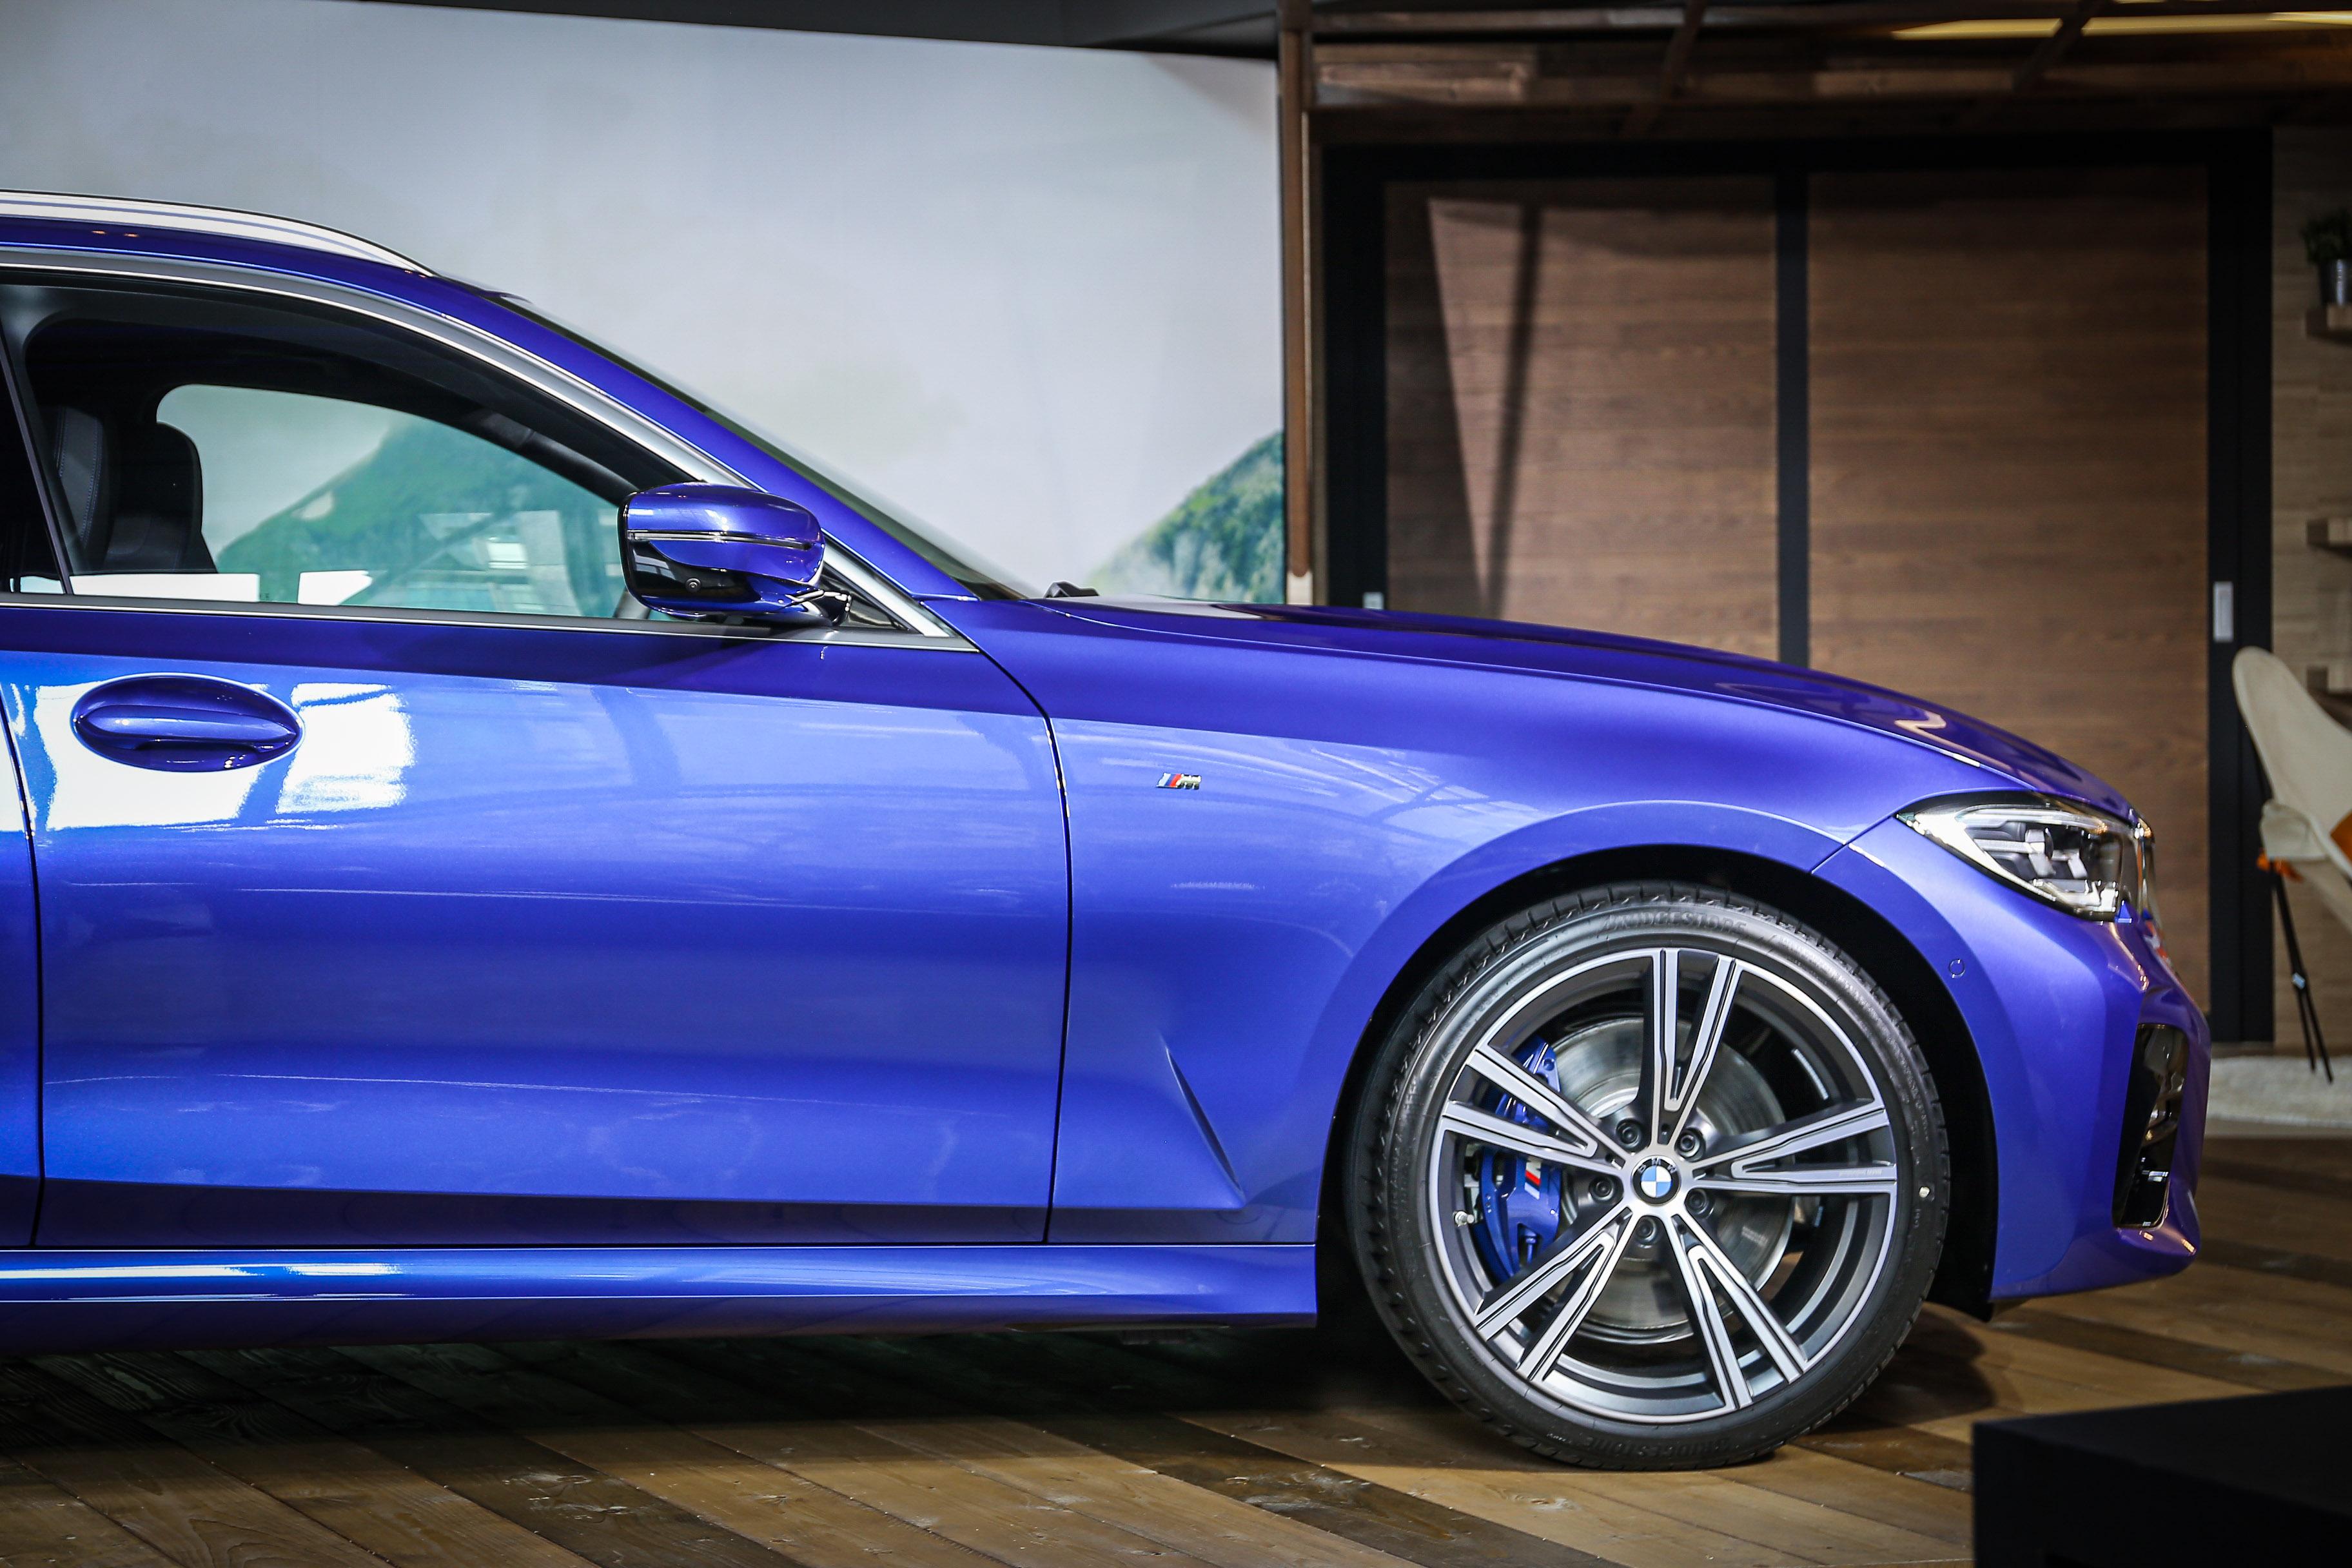 3 Series Touring 標配 BMW Individual 雙幅輪圈,並搭載 M 款煞車套件、可變式運動轉向系統。